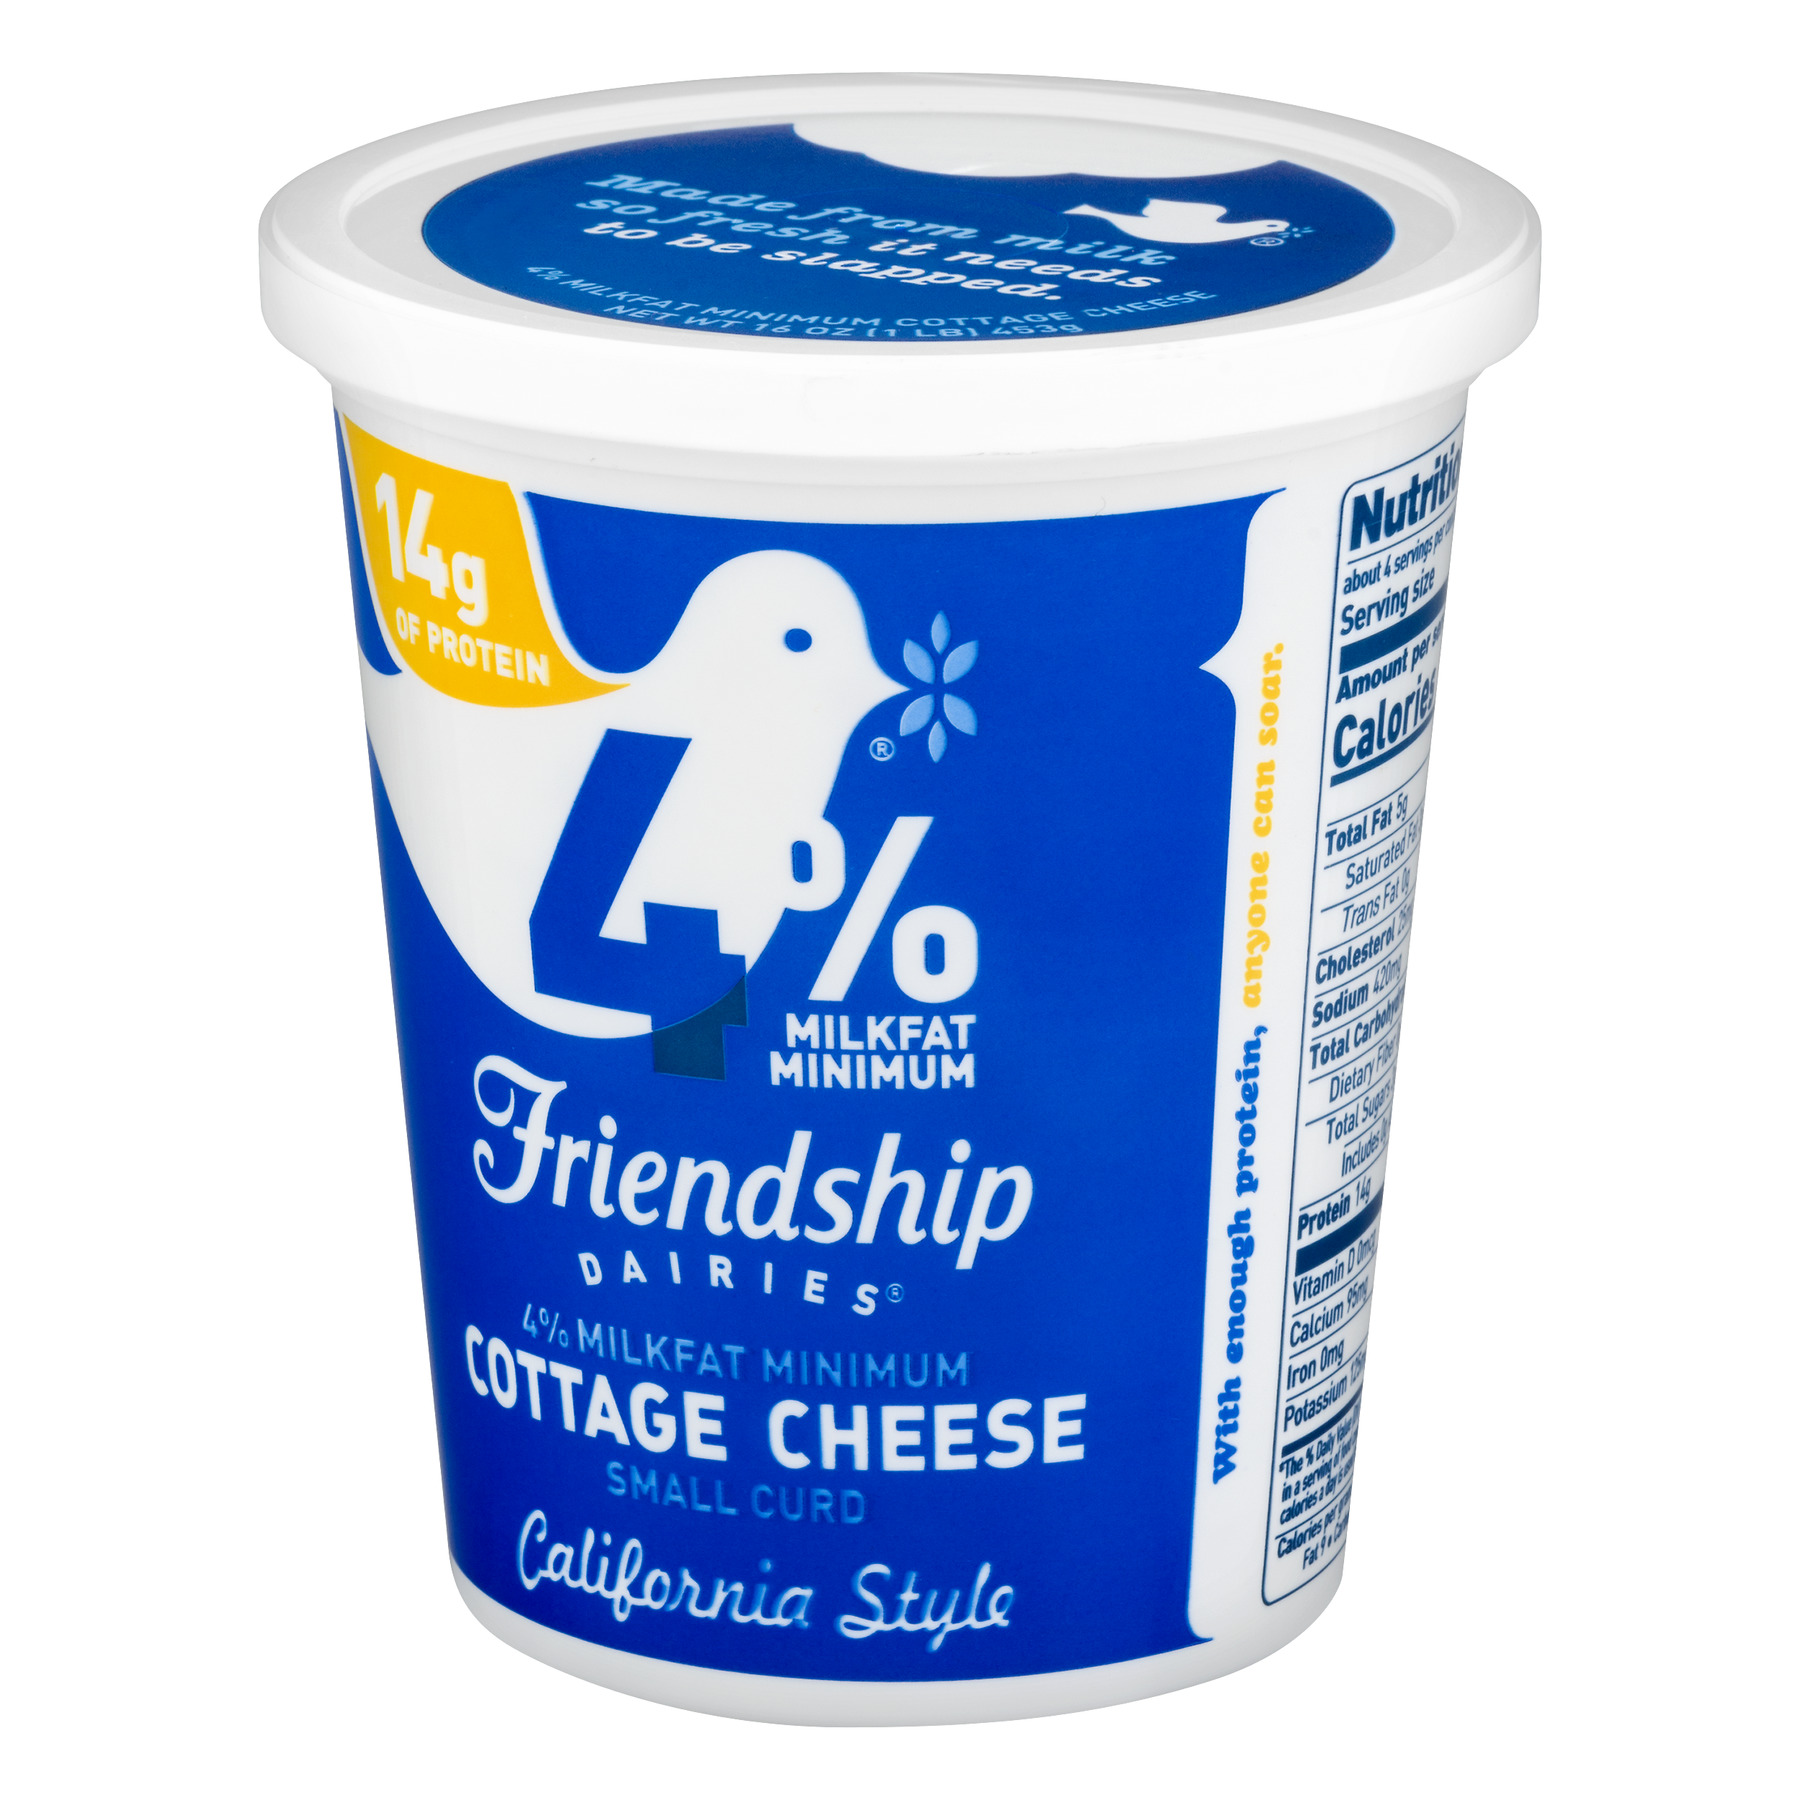 Astounding Friendship Dairies 4 Milk Fat Cottage Cheese Small Curd Home Interior And Landscaping Fragforummapetitesourisinfo